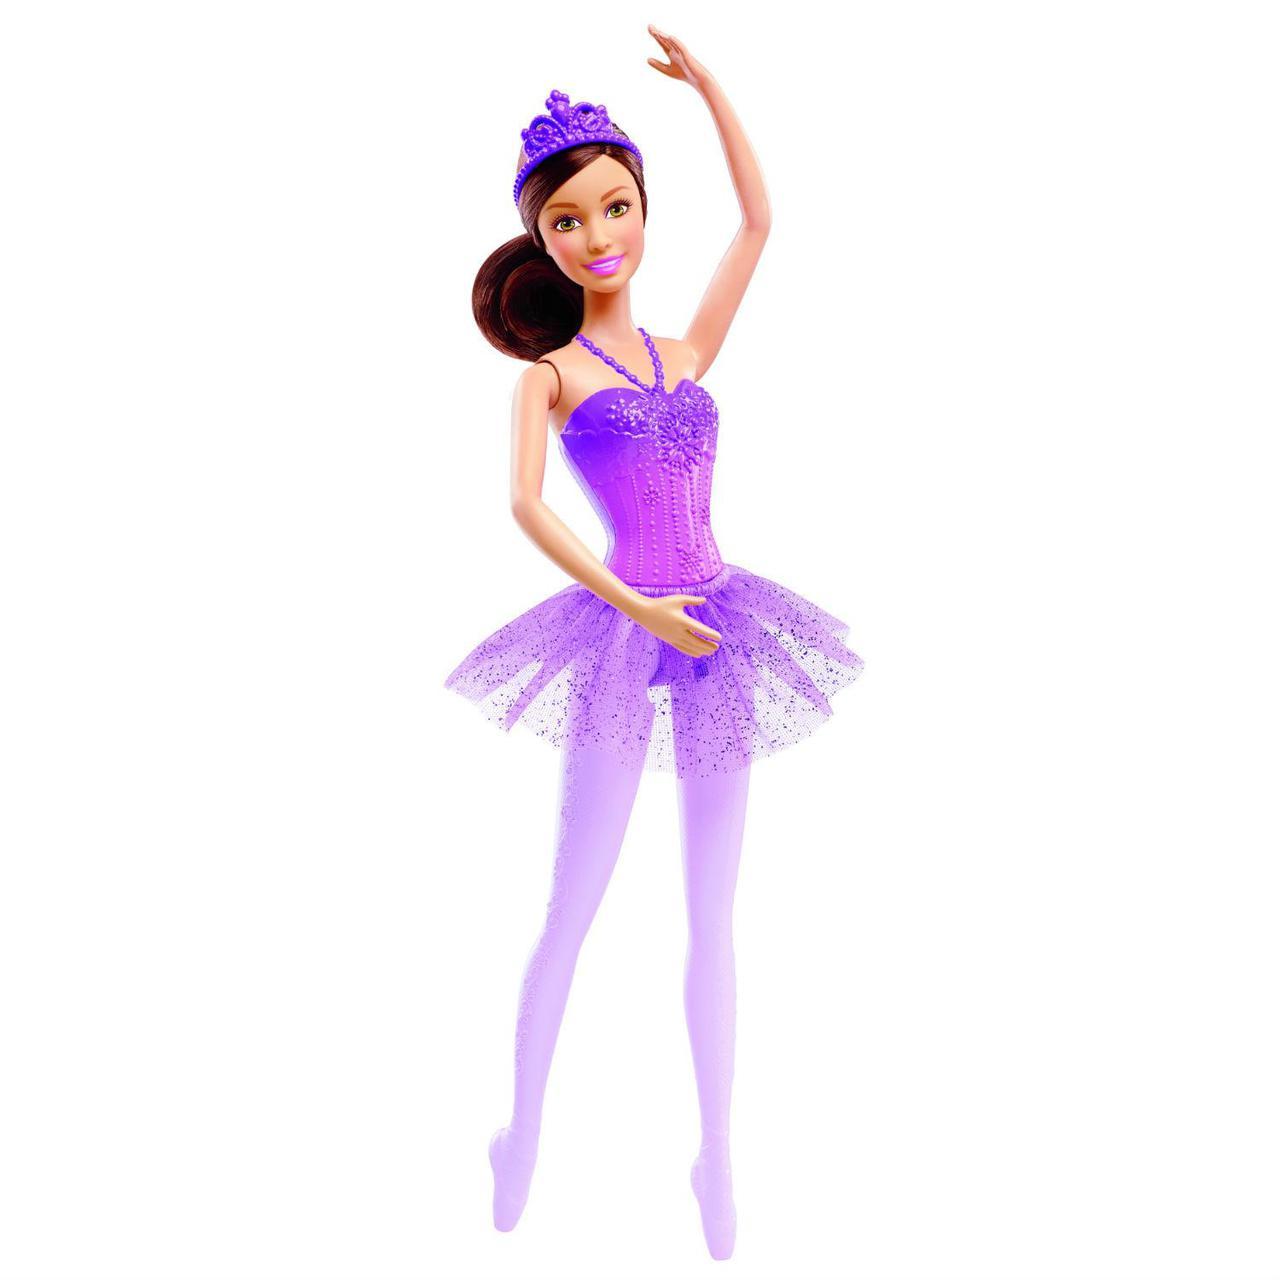 Barbie Кукла Барби - Балерина, Брюнетка в фиолетовой пачке